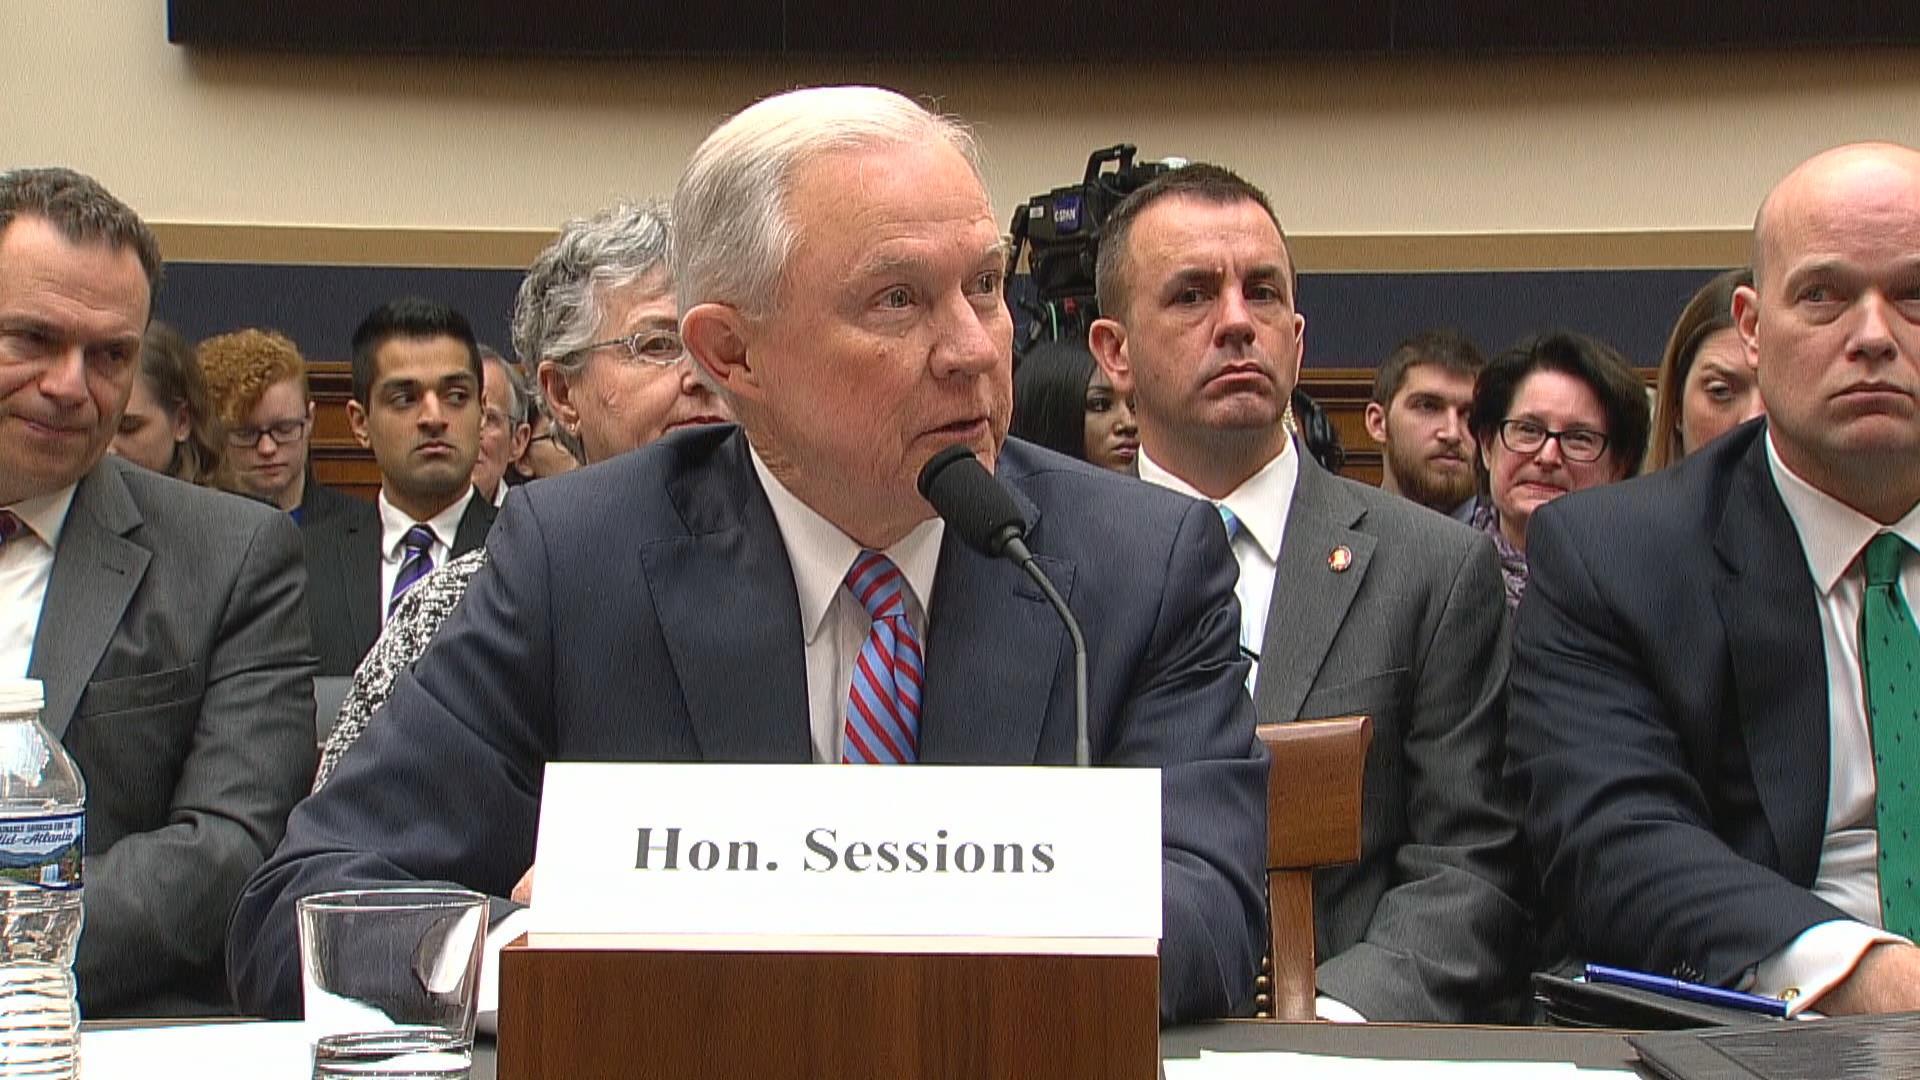 Sessions faces massive pressure to go...